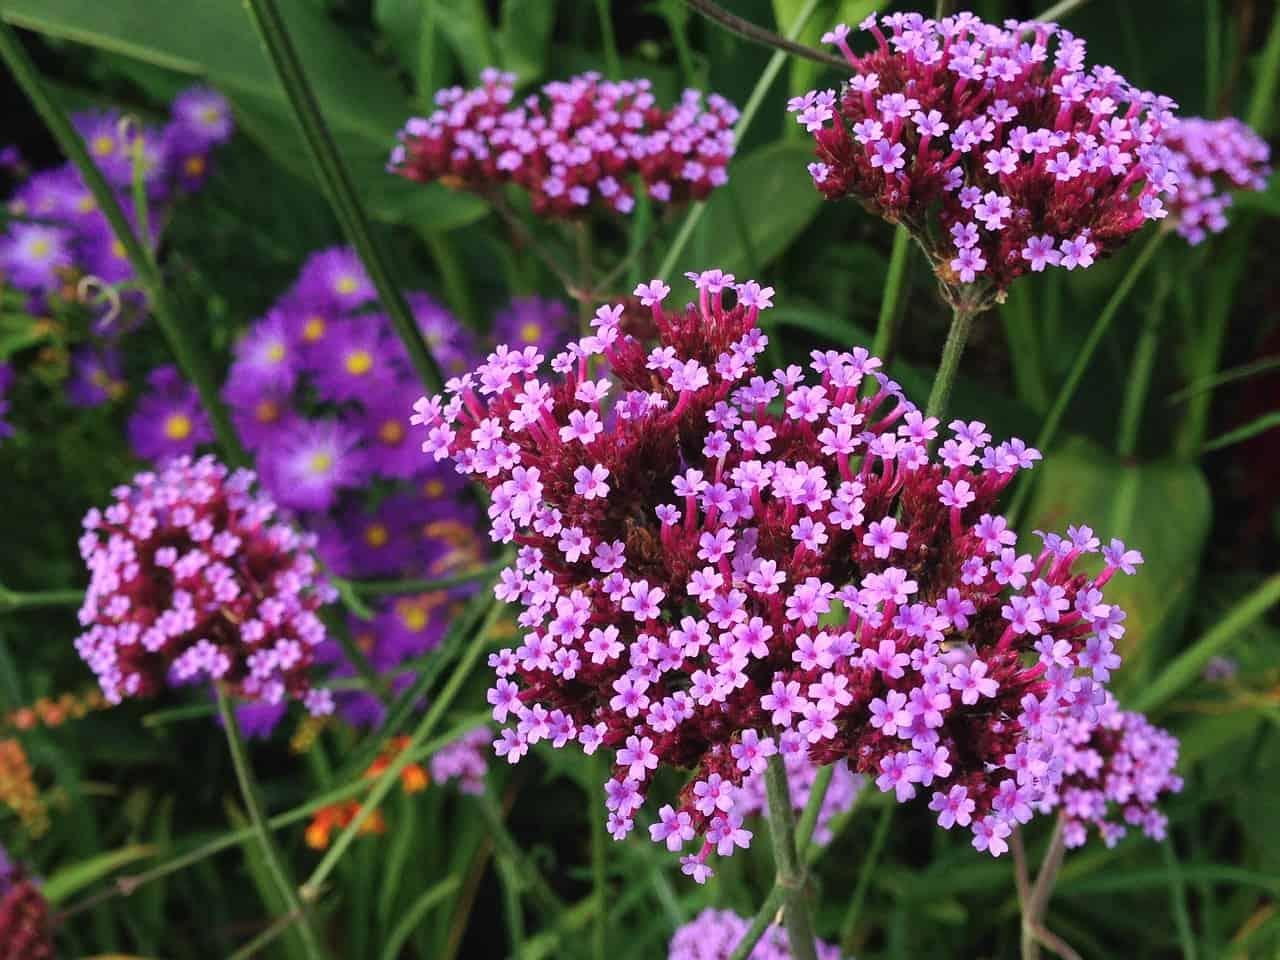 Verbena flower.